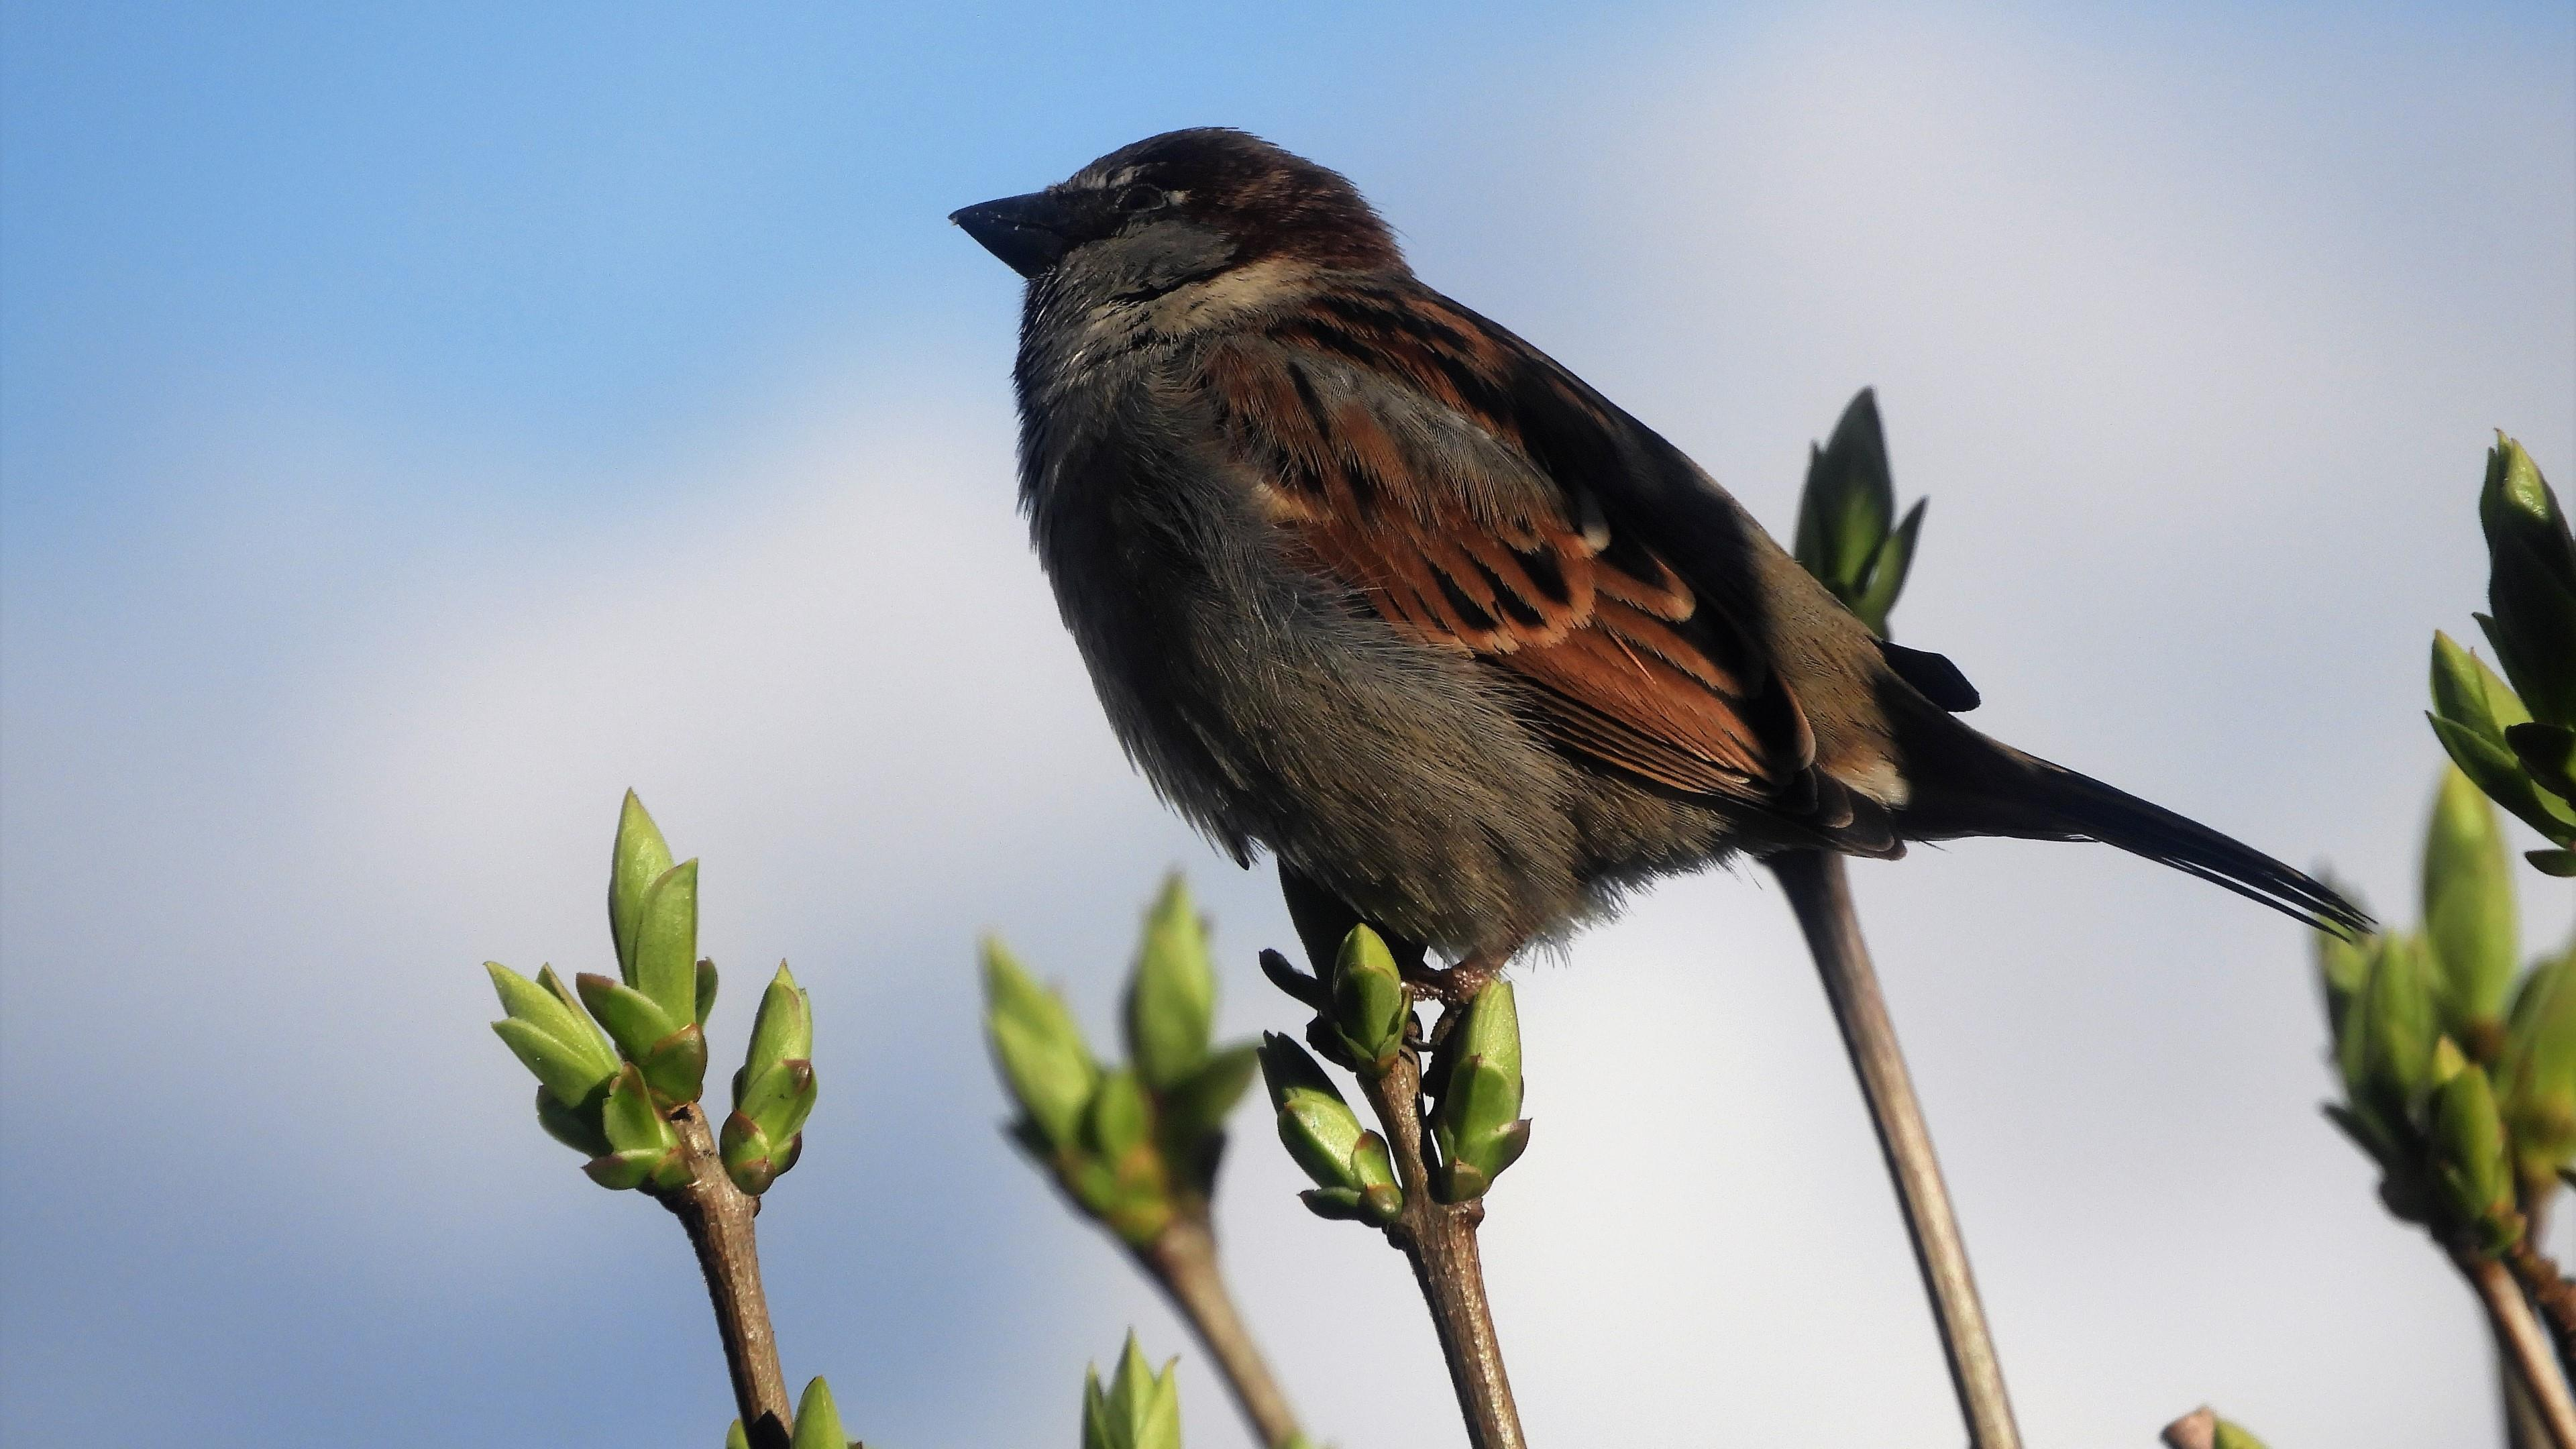 Sparrow bird wallpaper